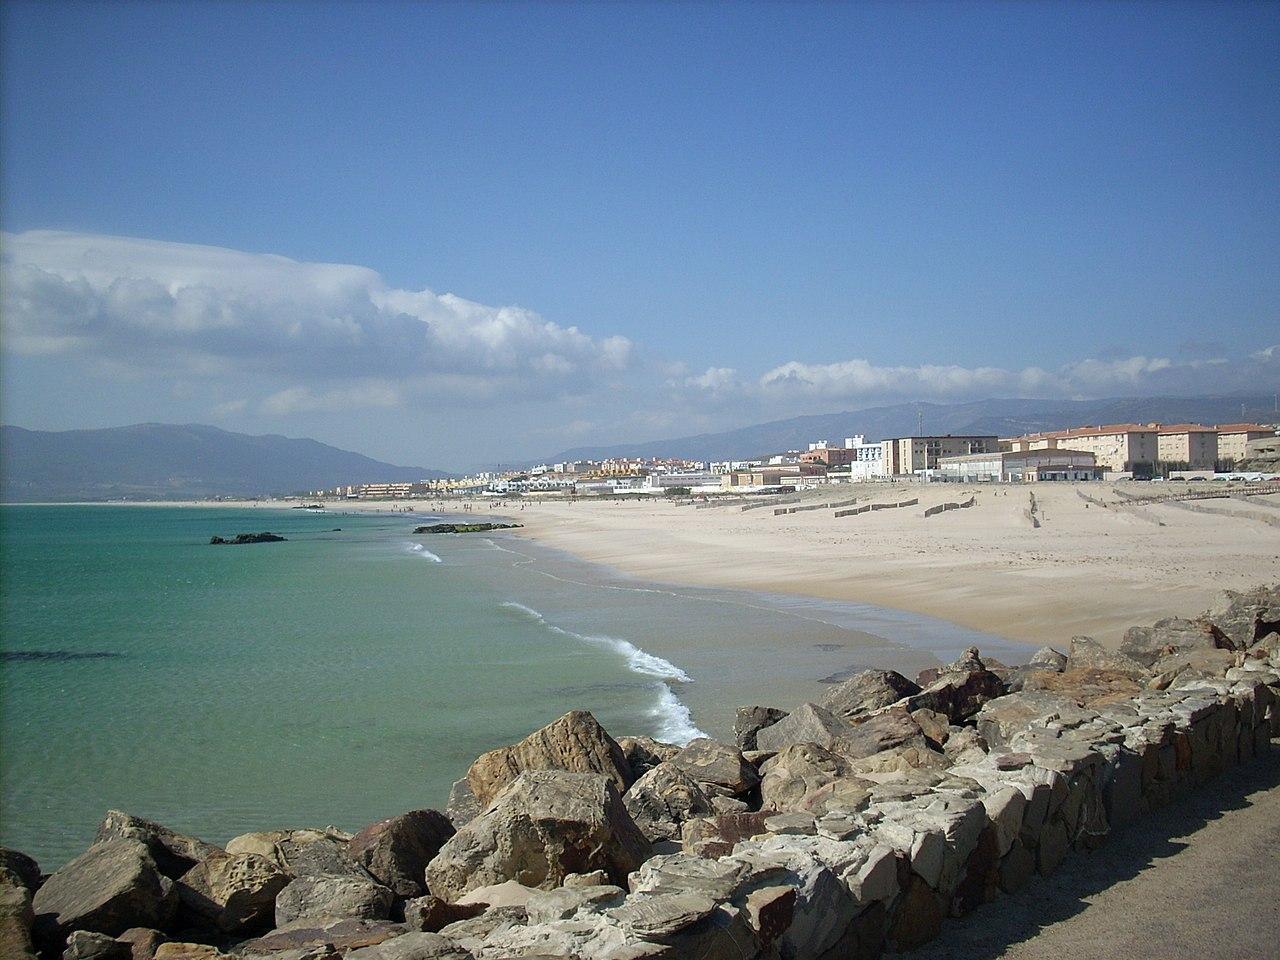 Paseo en la playa - 1 2